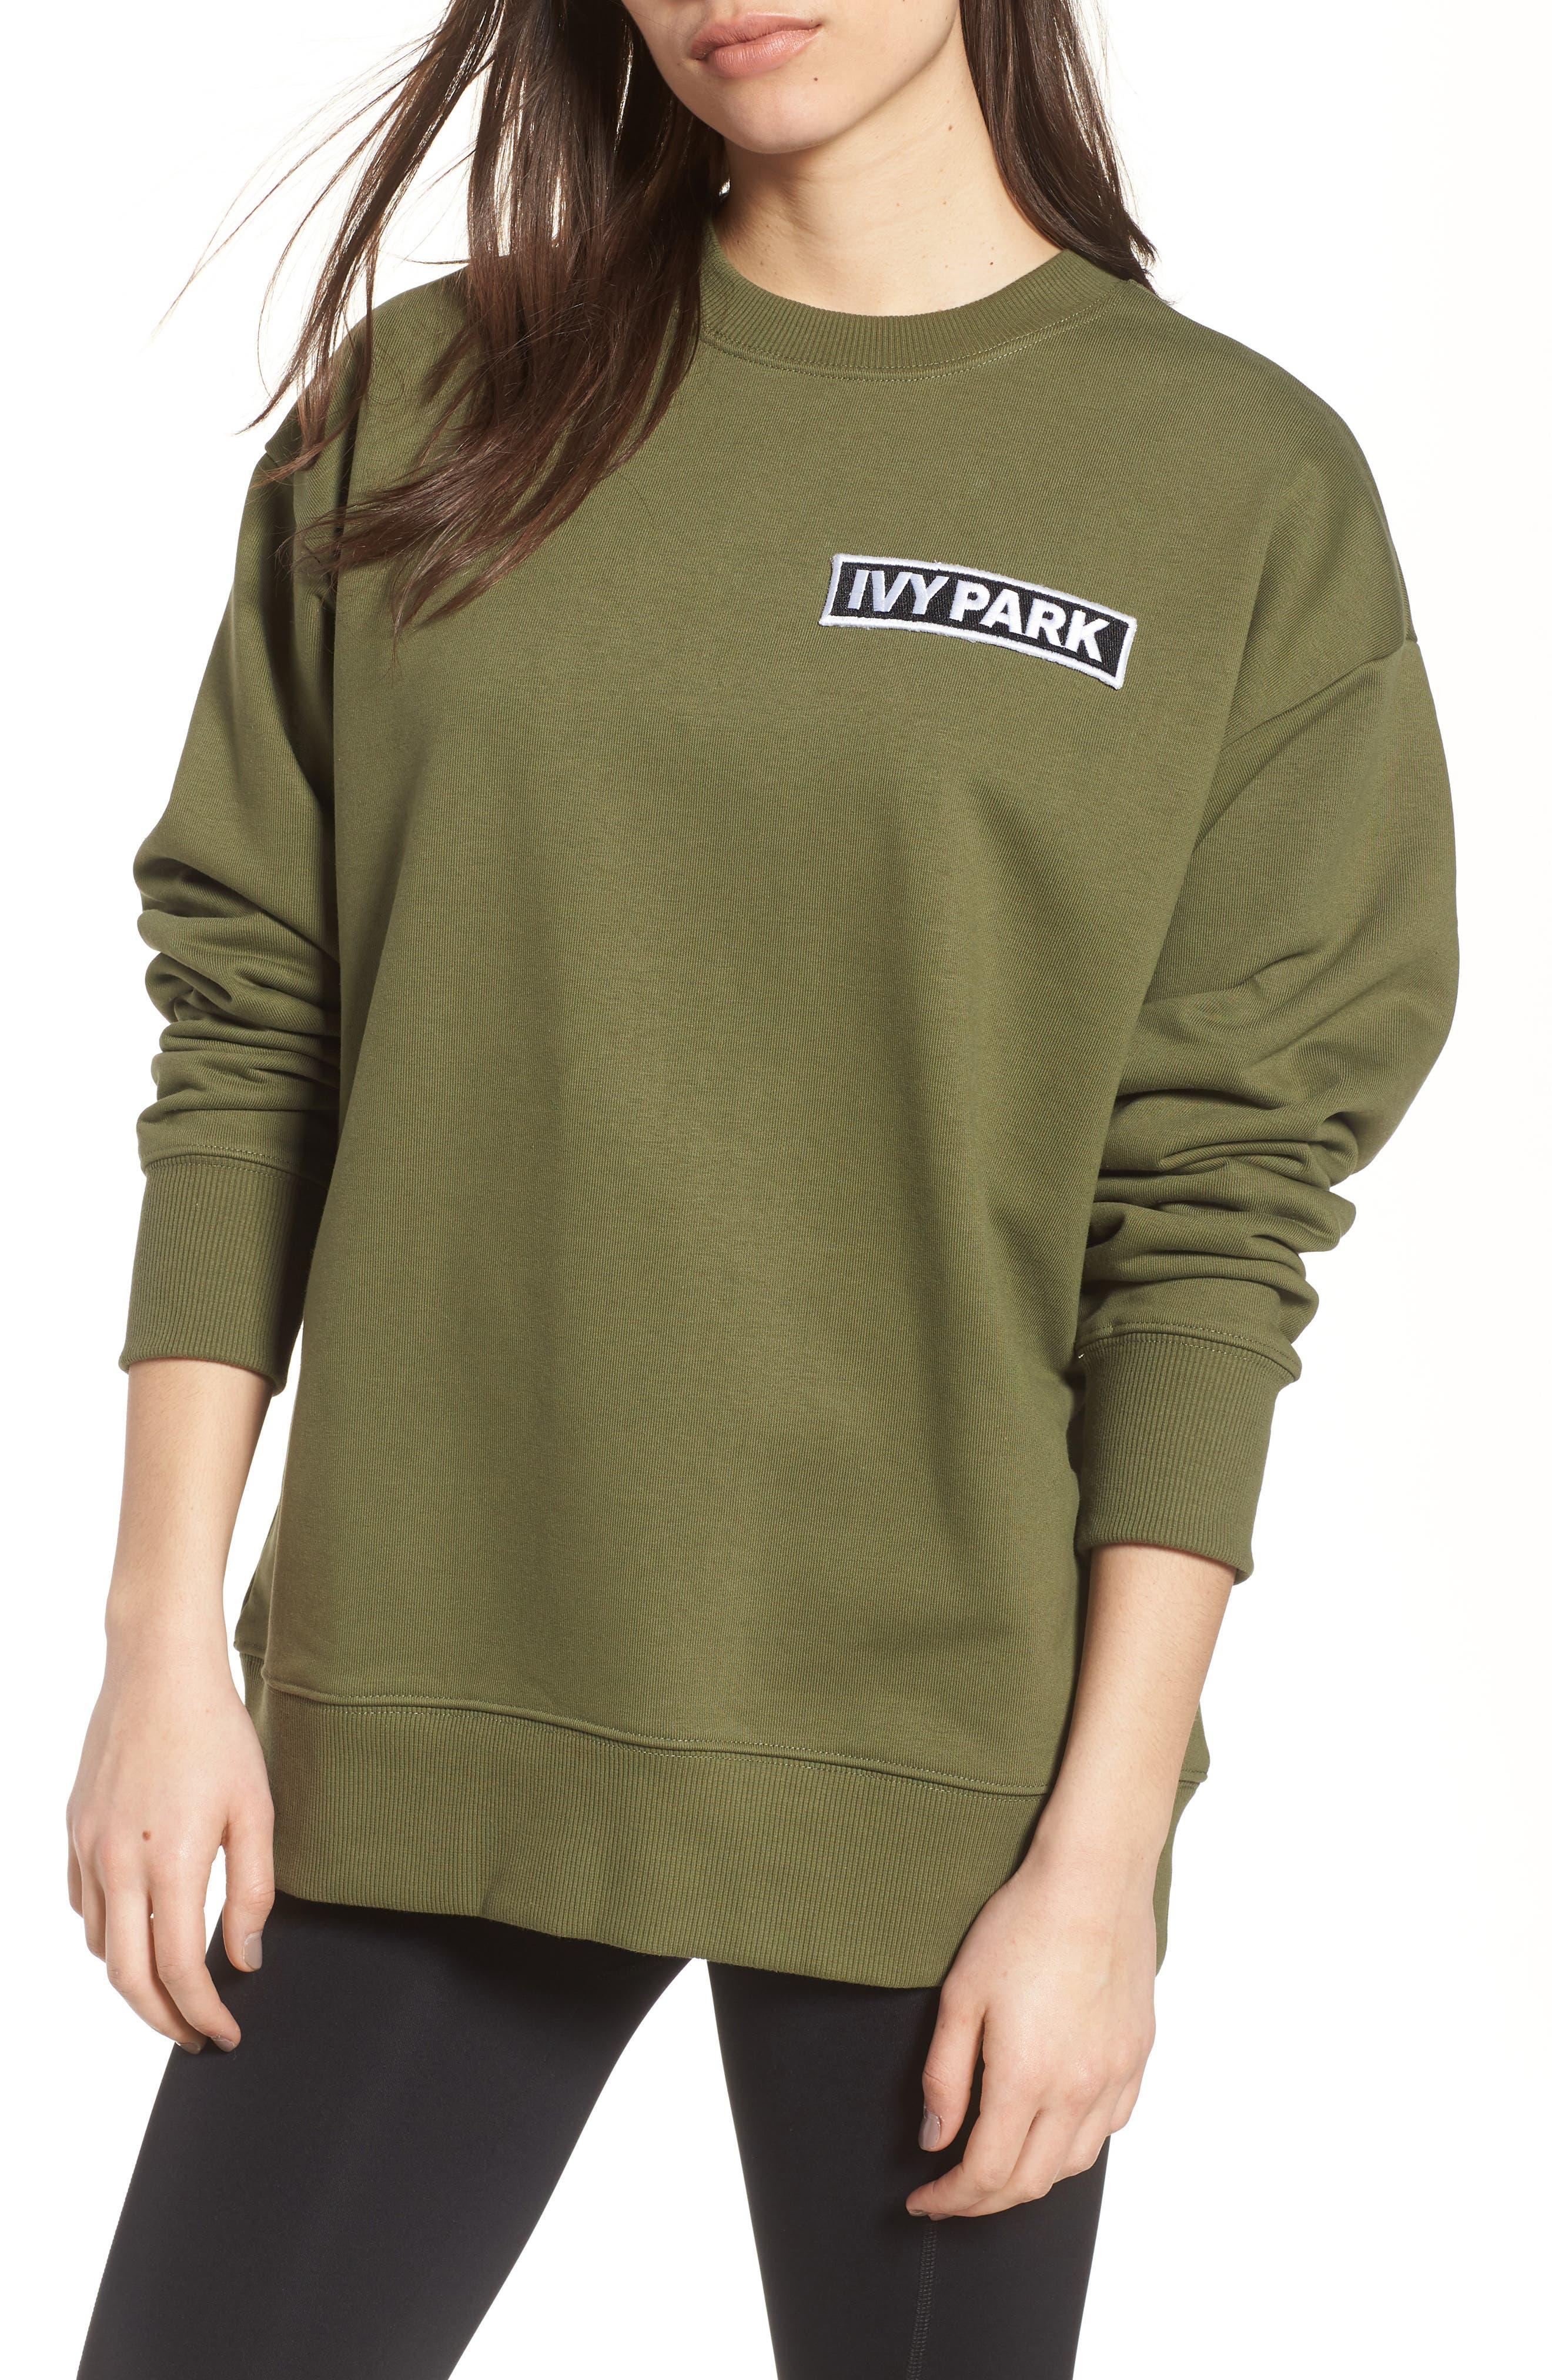 IVY PARK® Badge Logo Sweatshirt